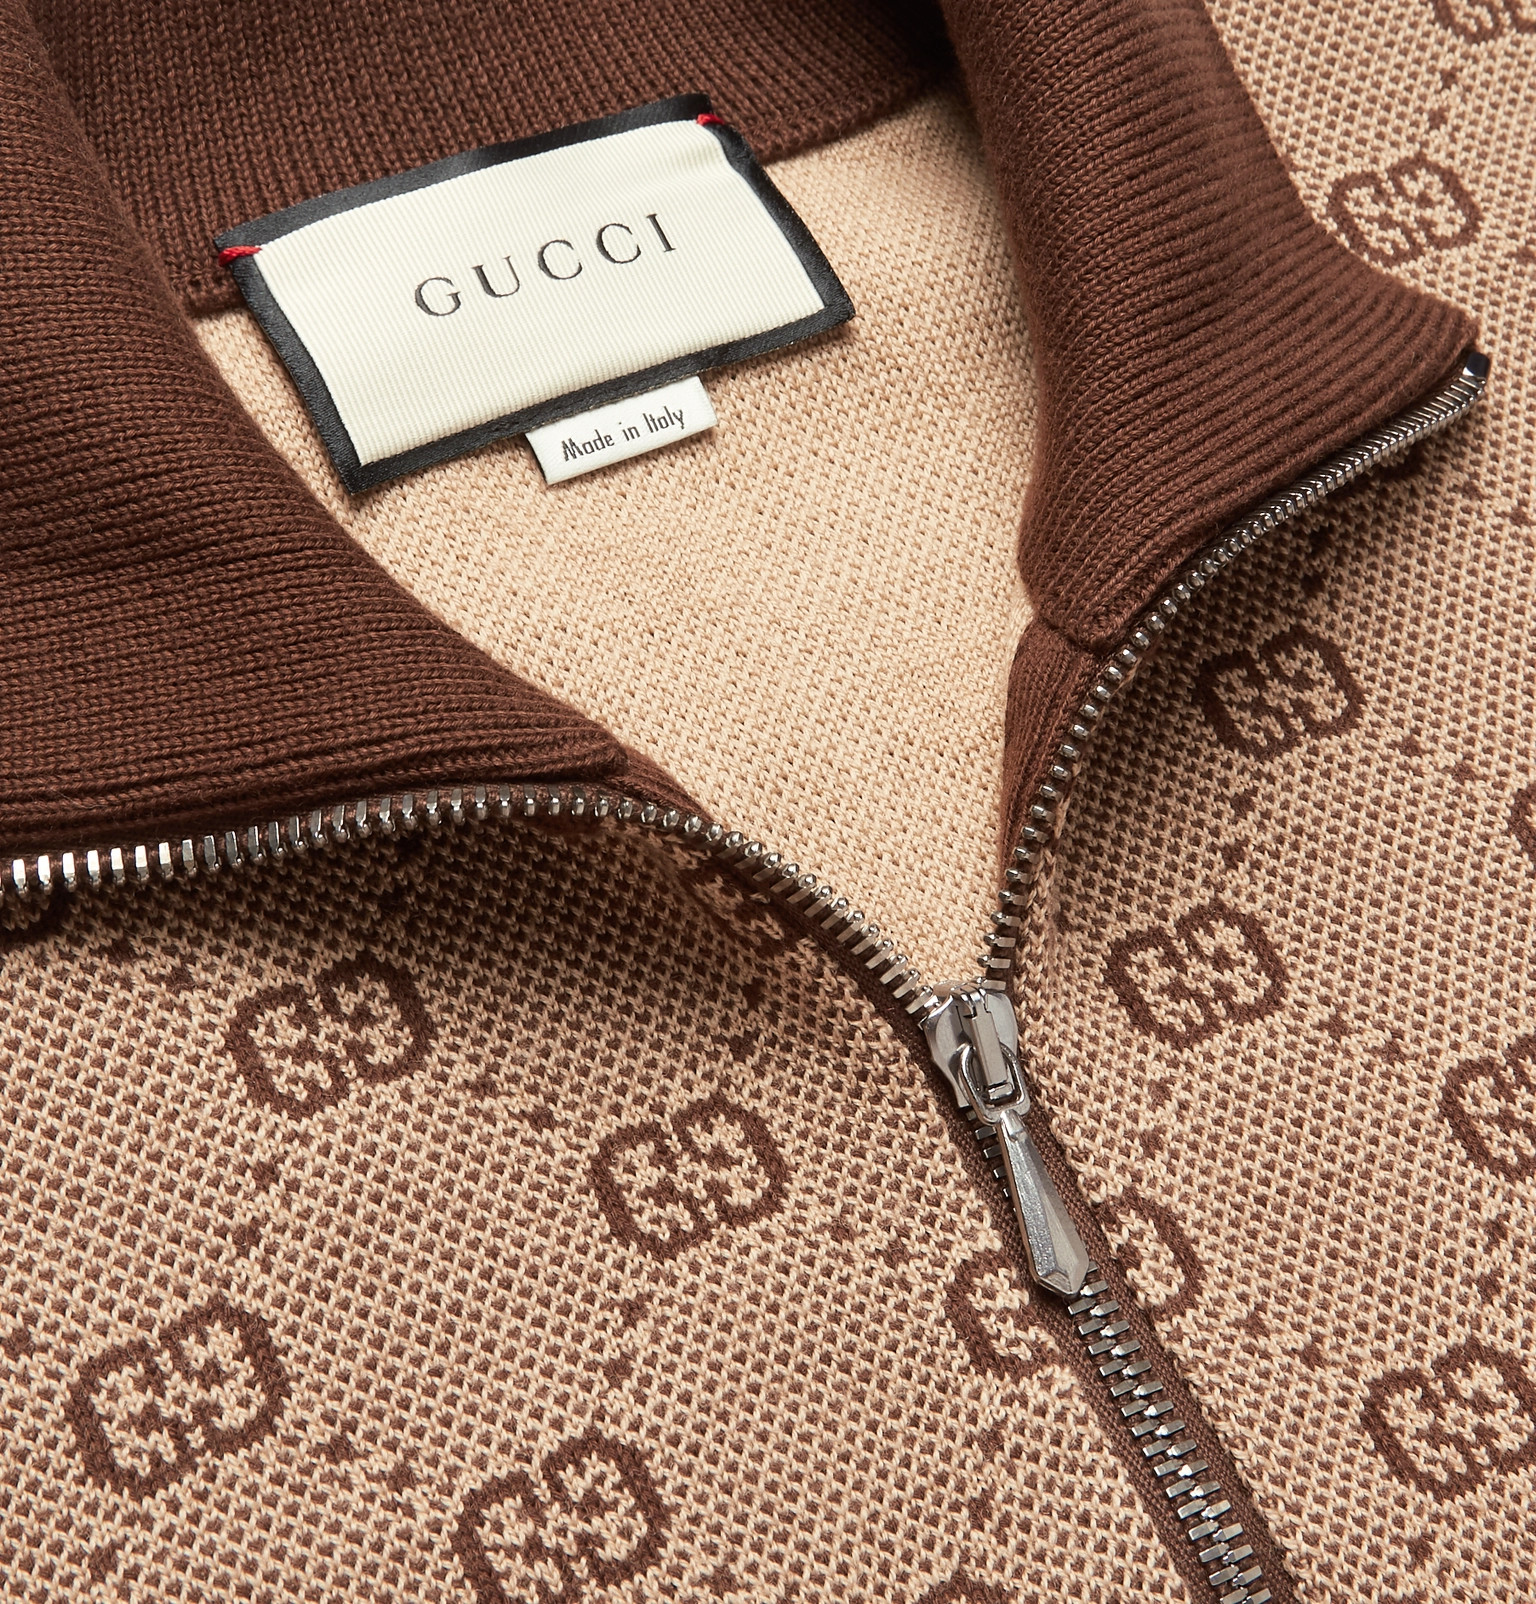 886f4fb88752 Gucci - Logo-Jacquard Wool and Cotton-Blend Track Jacket